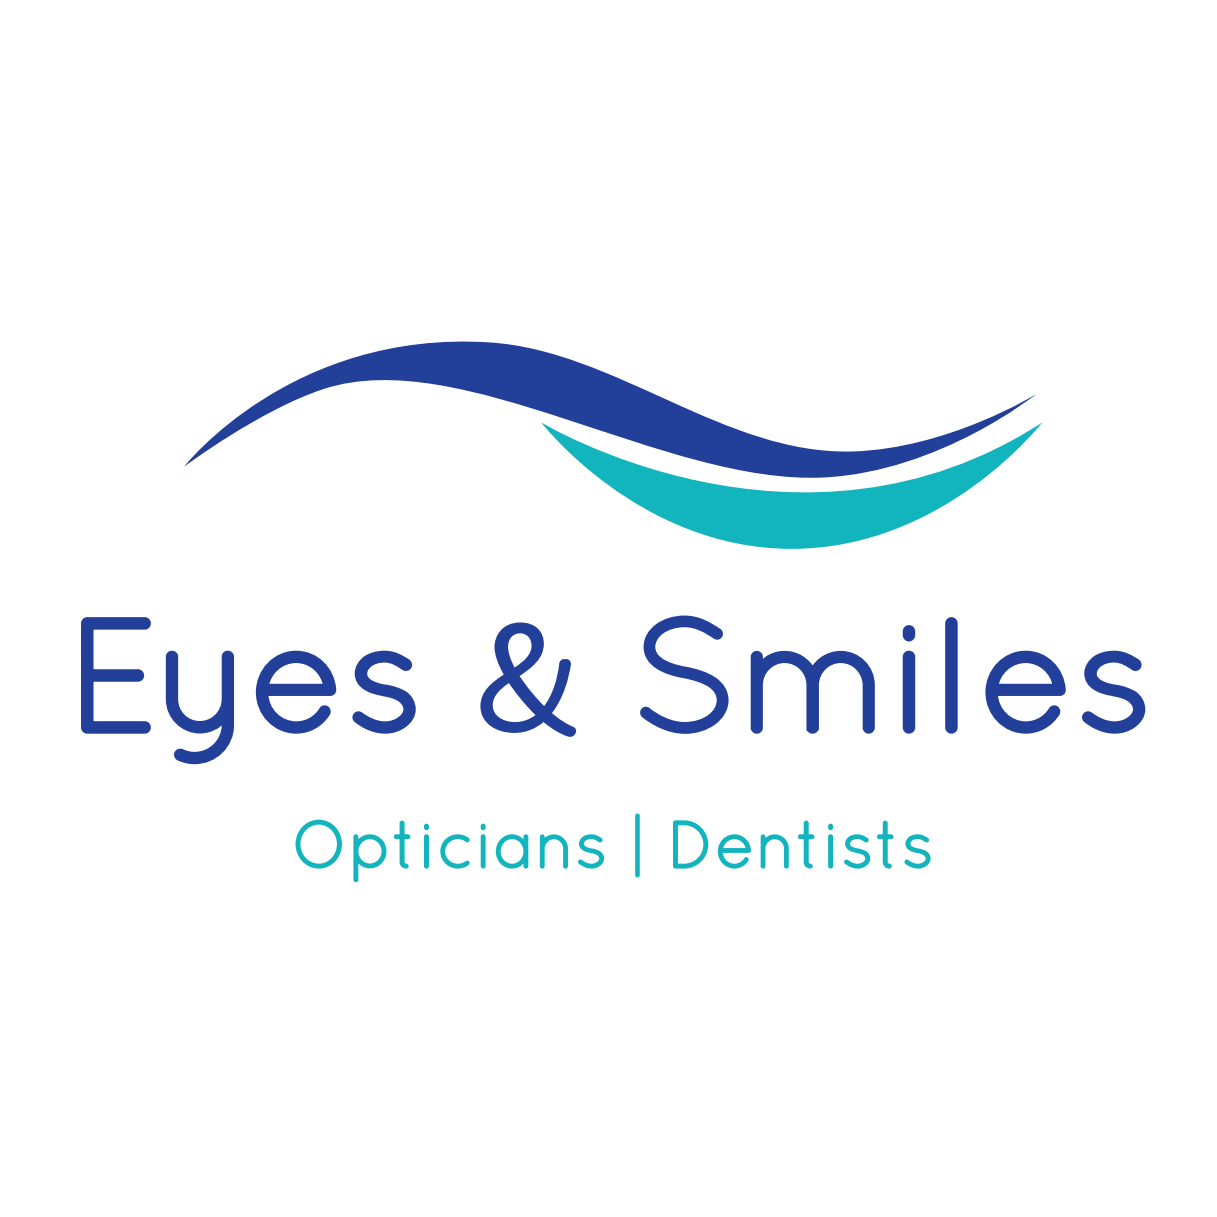 Eyes & Smiles - Opticians & Dentists - London, London N11 3EG - 020 8368 0924 | ShowMeLocal.com